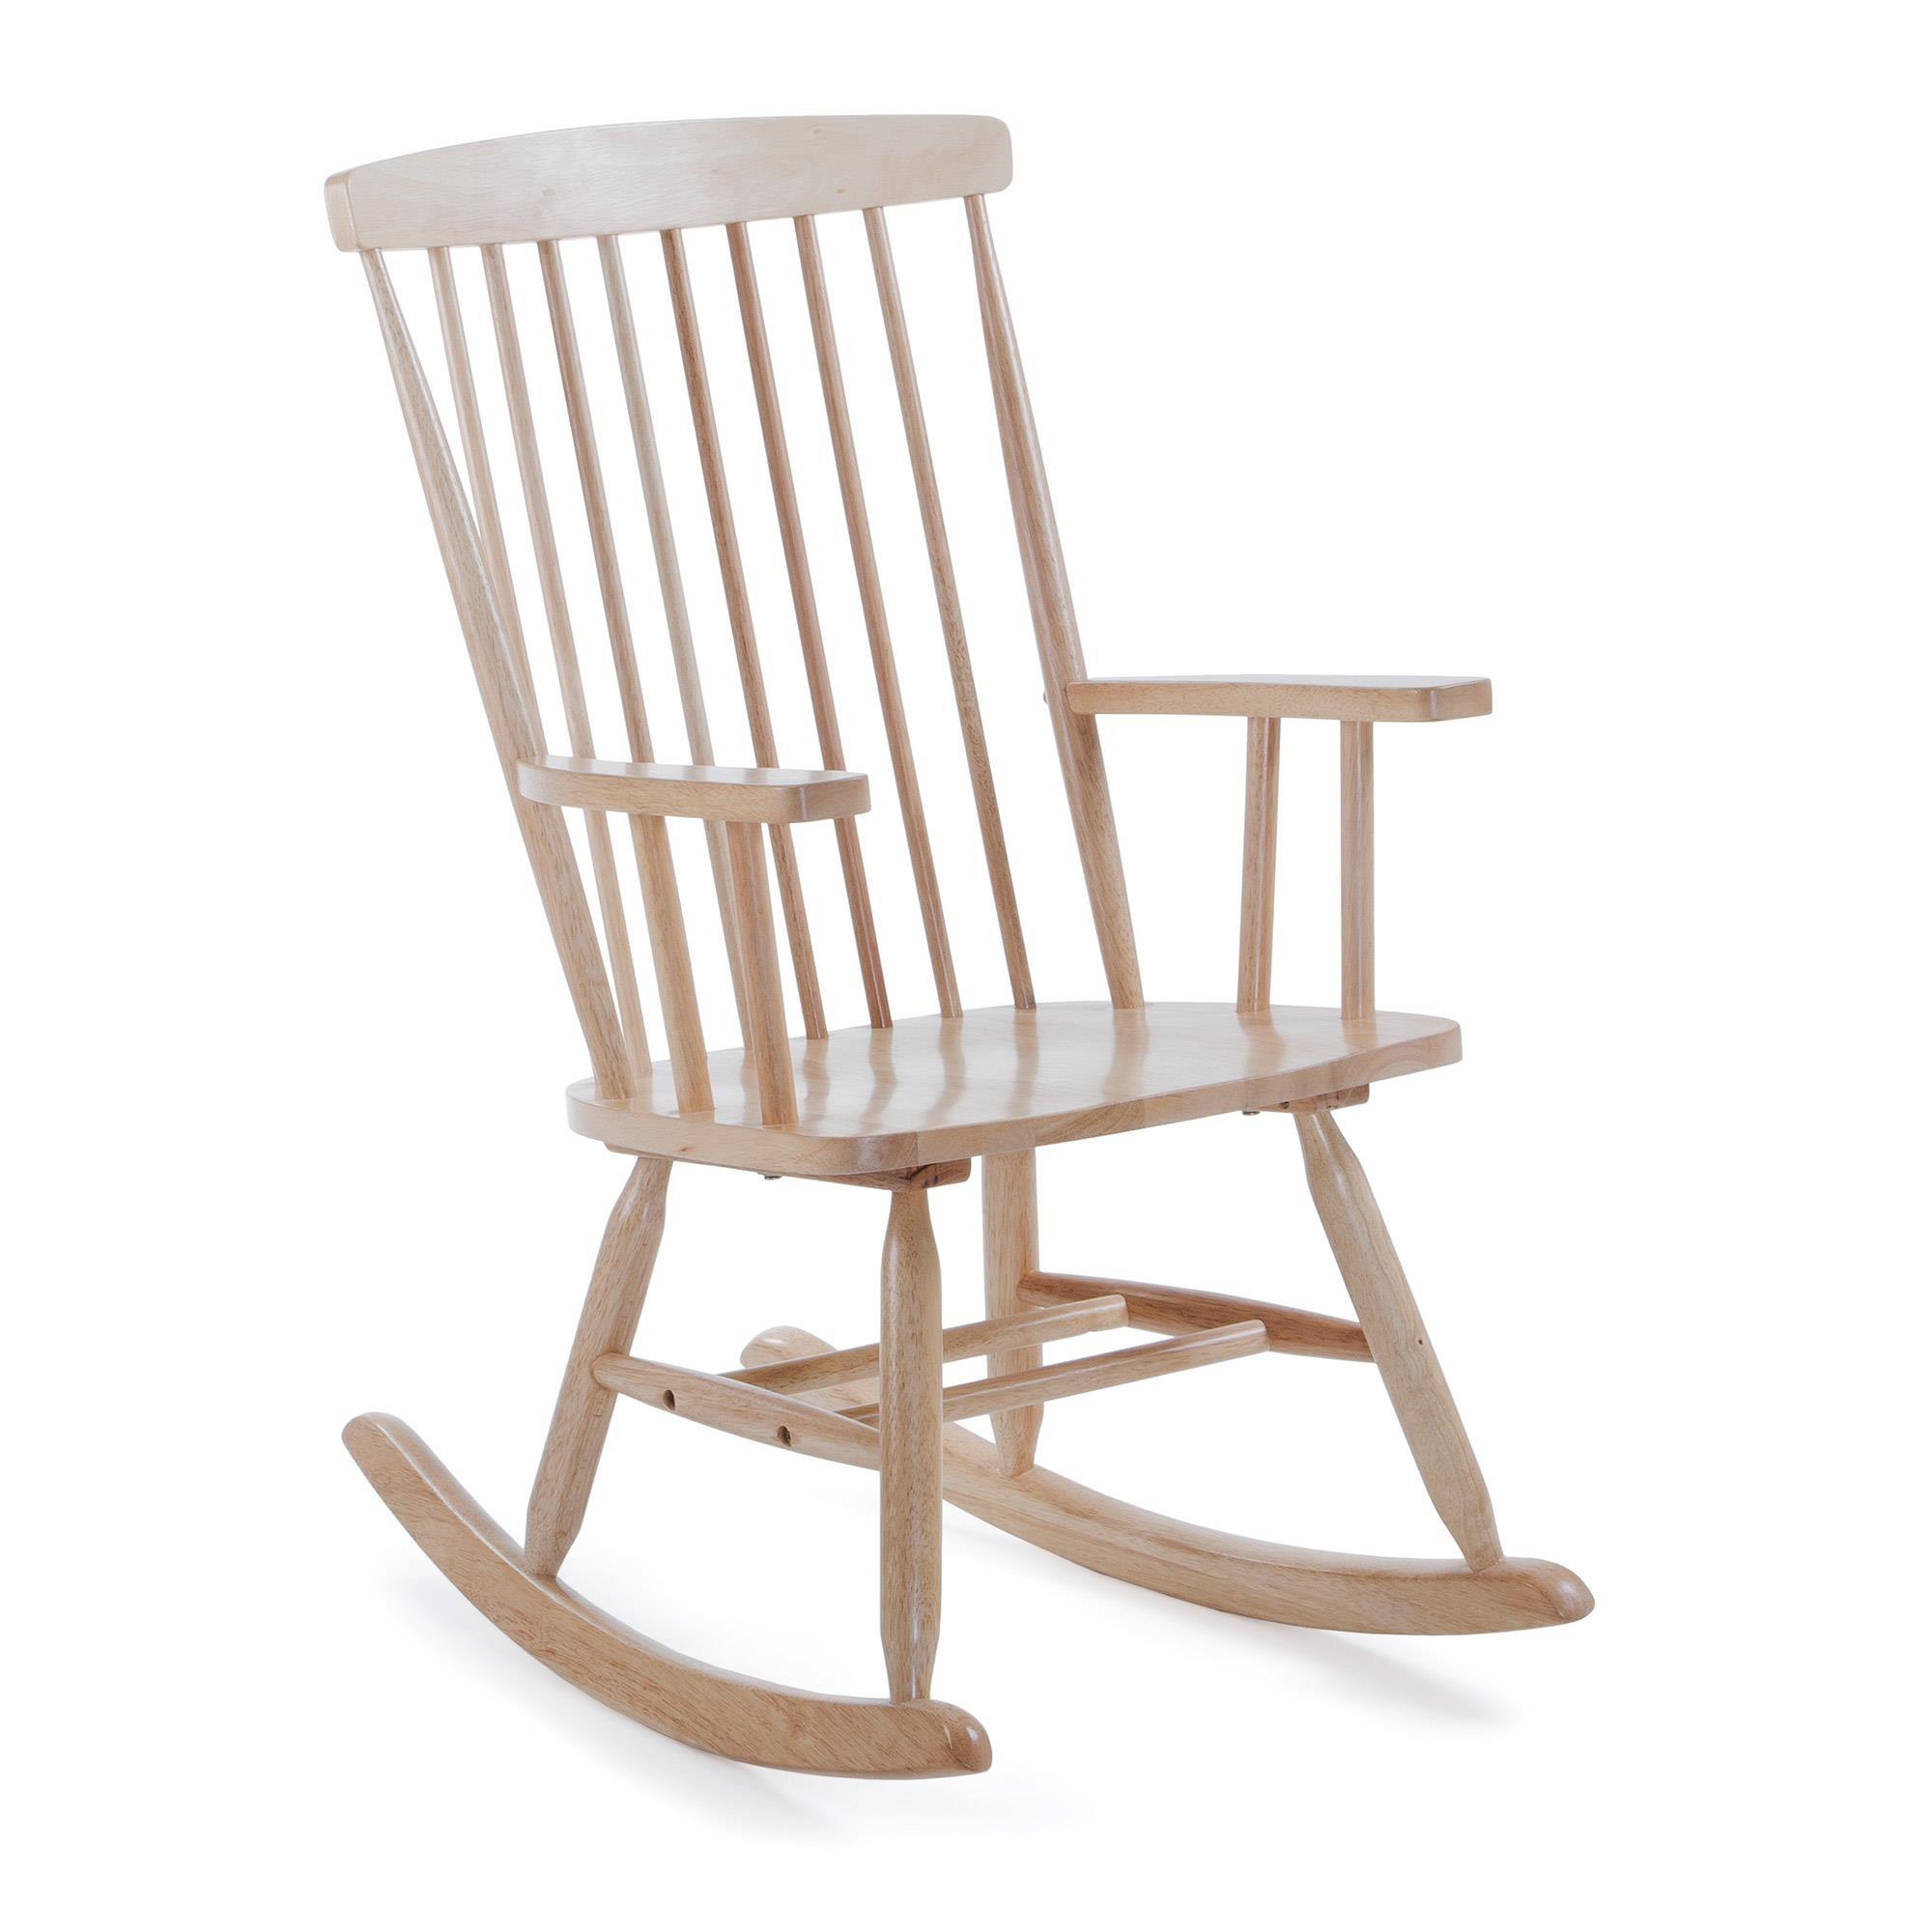 Fotel bujany Terence drewniany